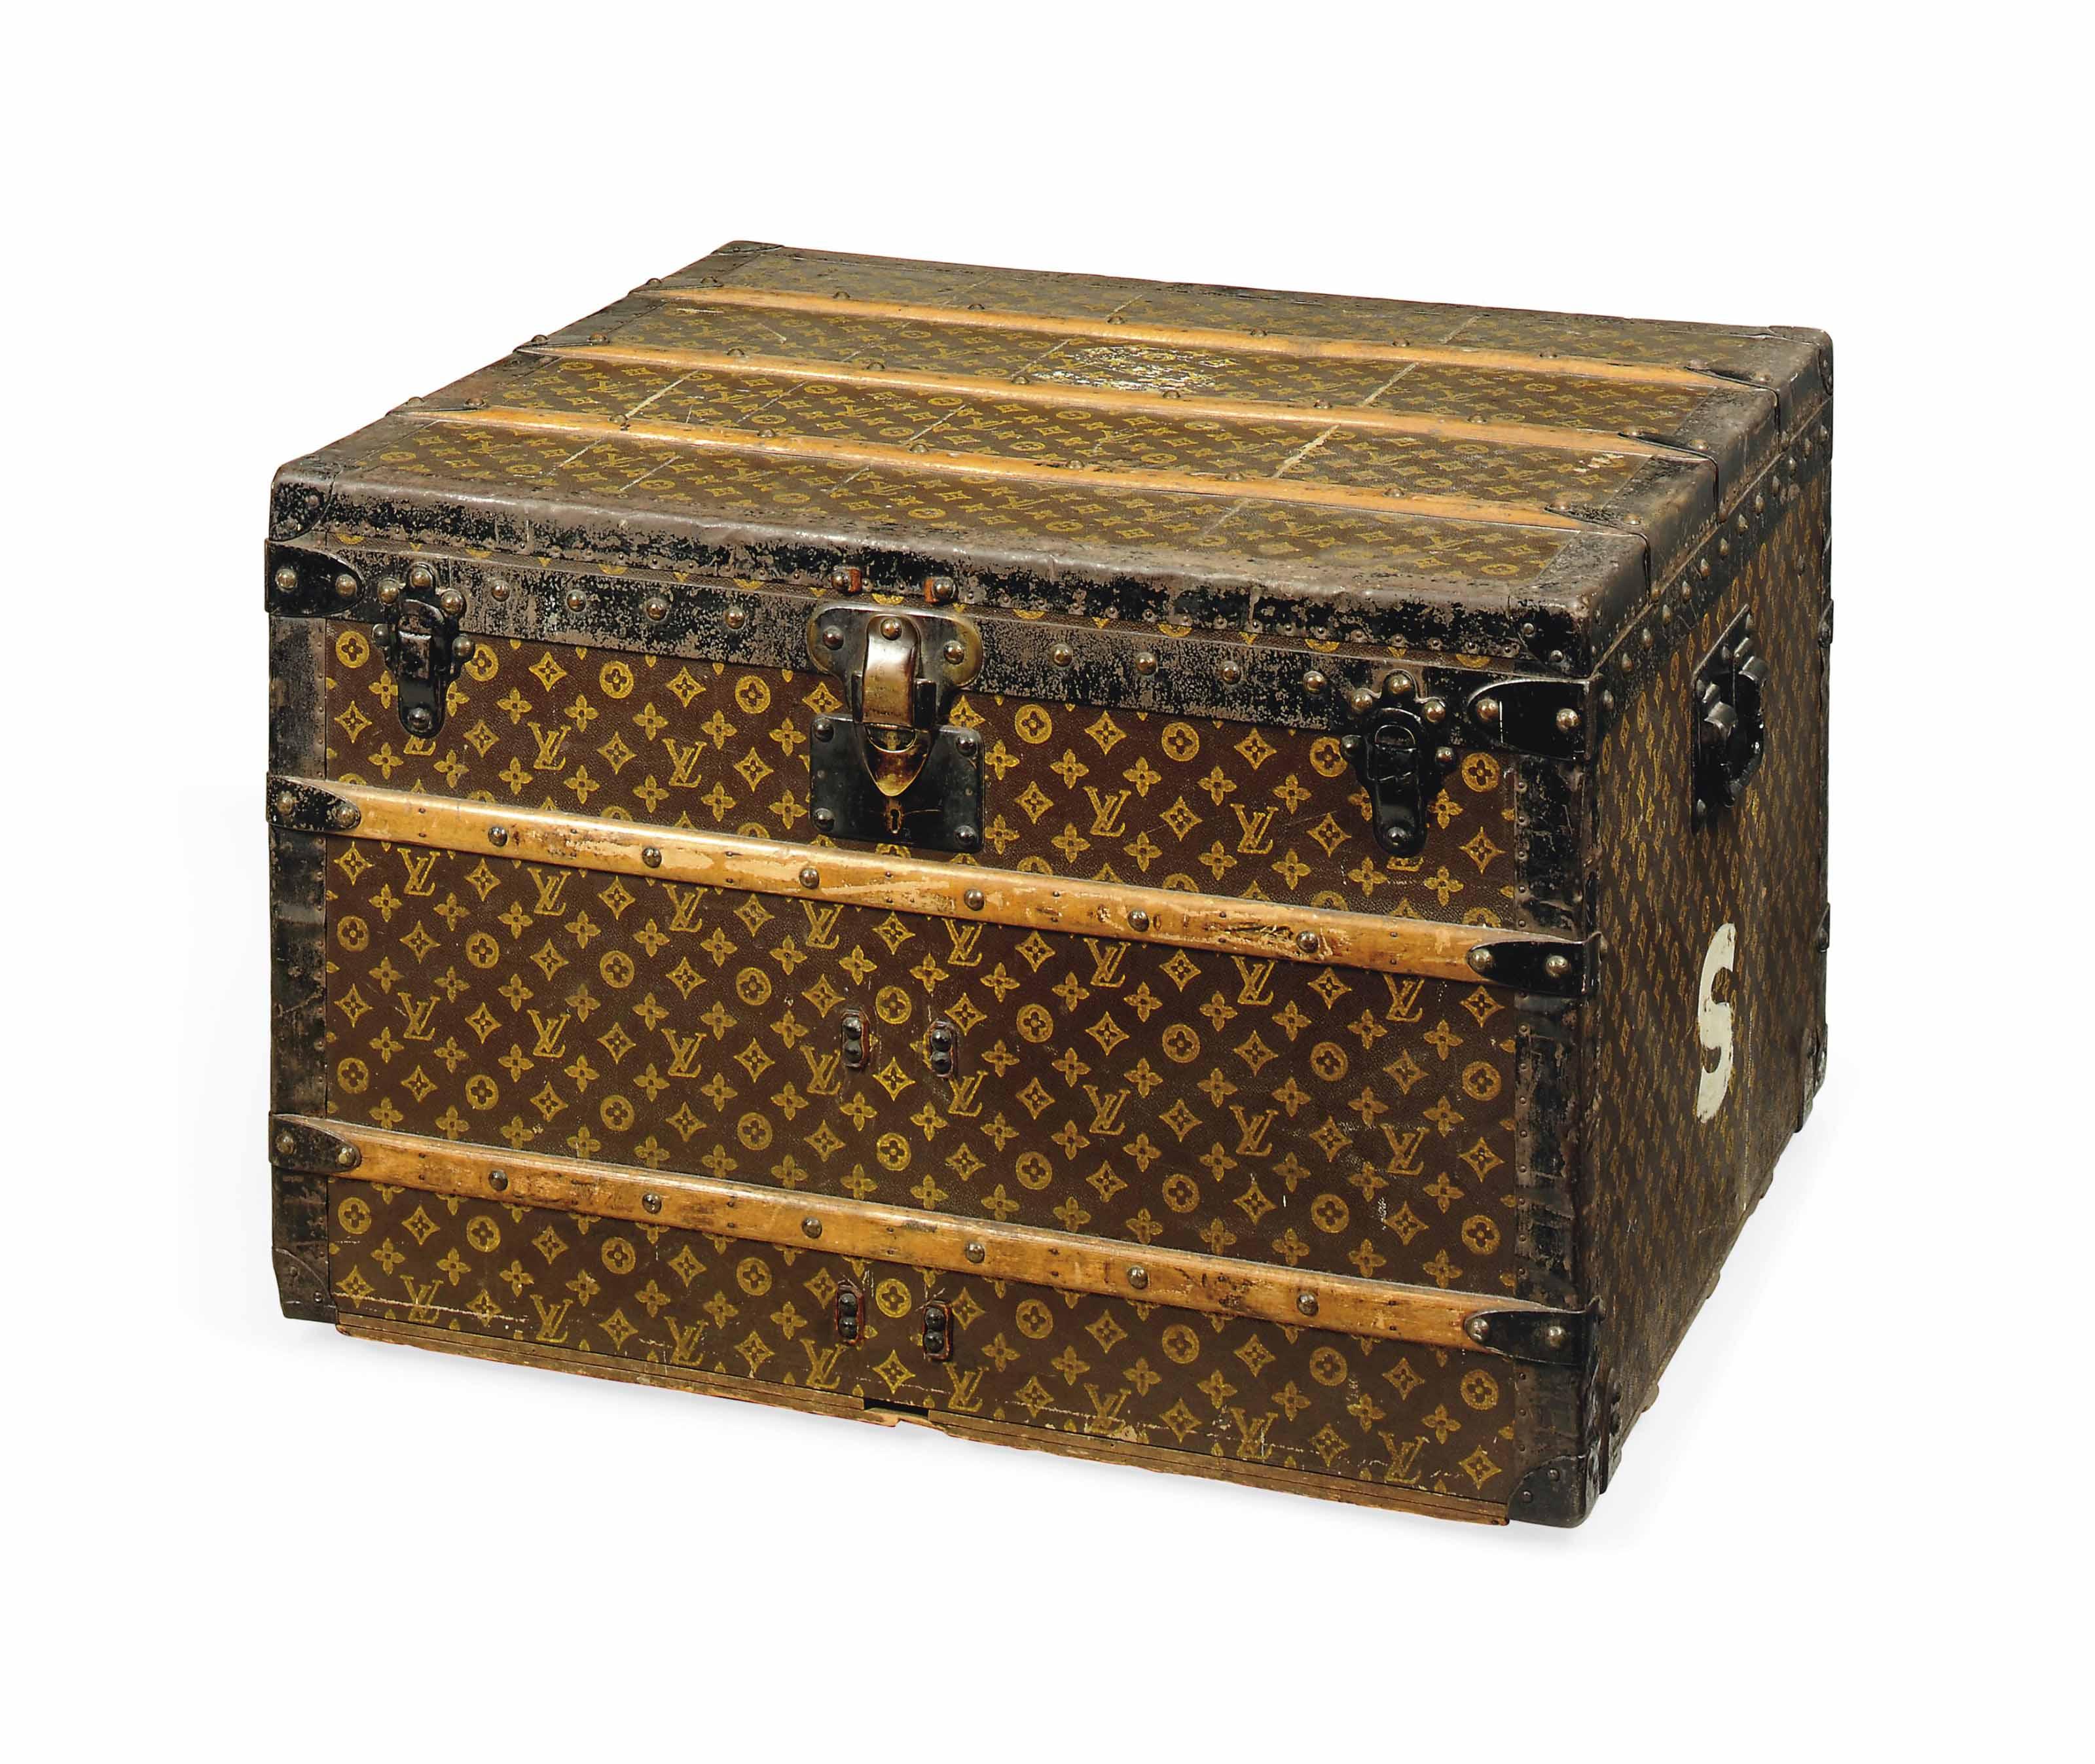 A BOX TRUNK IN MONOGRAM CANVAS